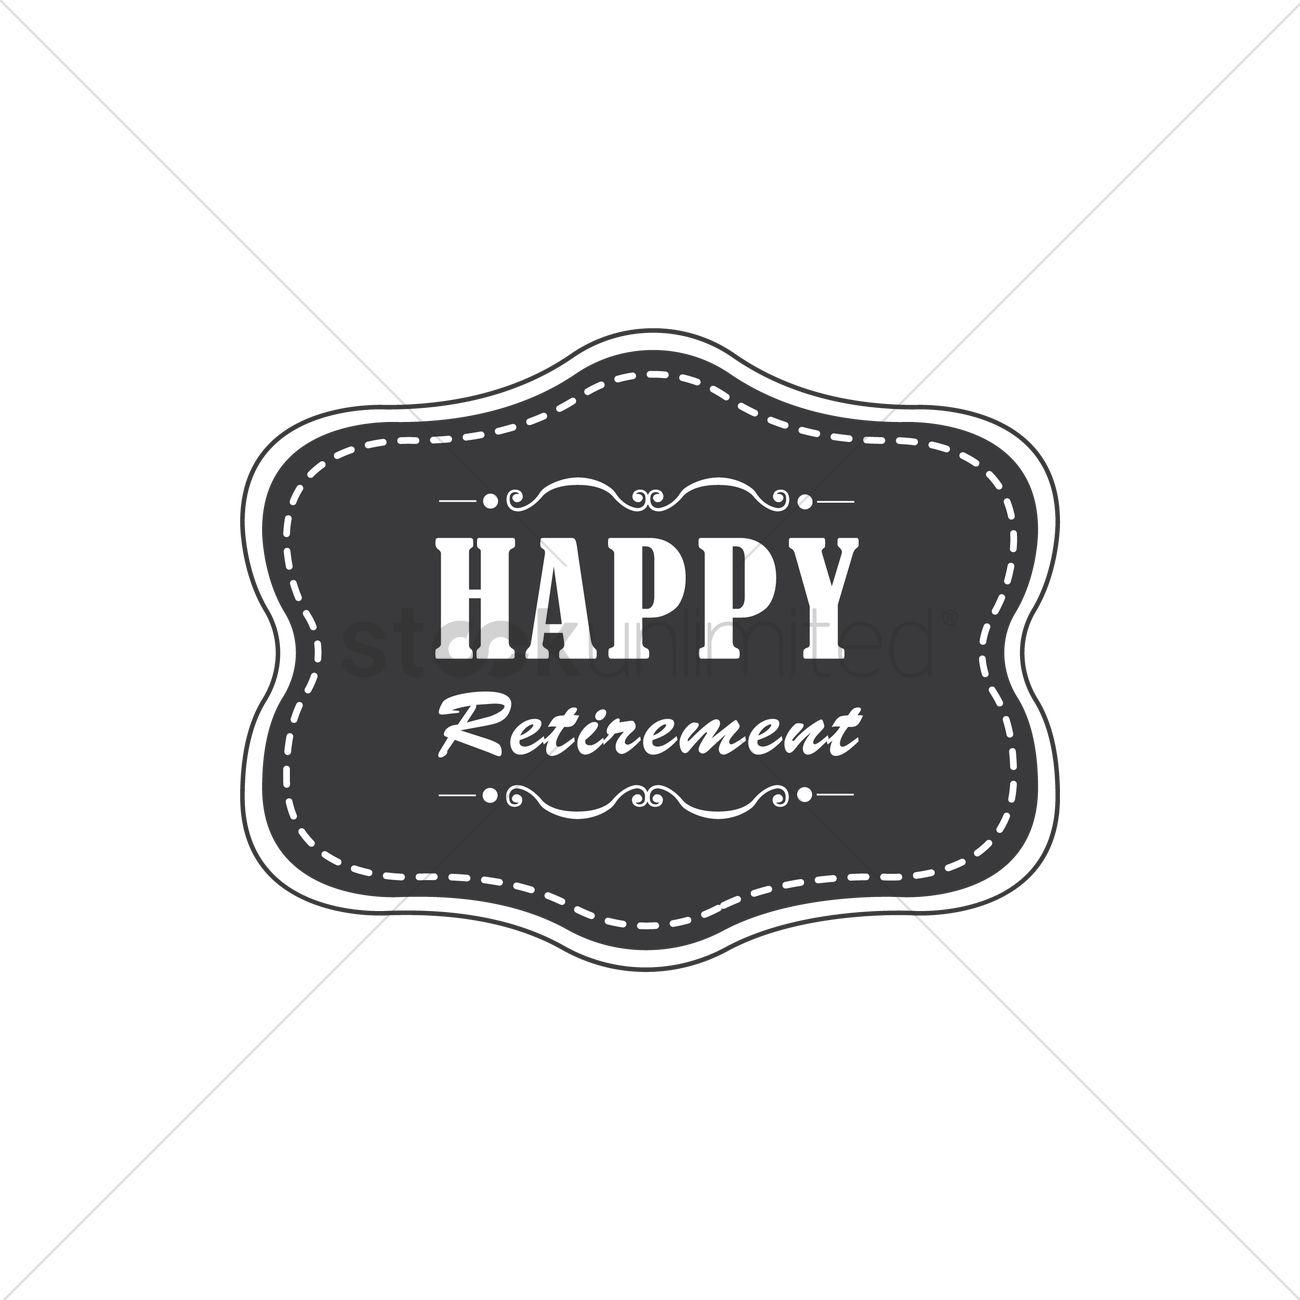 happy retirement label vector image 1791444 stockunlimited clipart retirement humorous clip art retirement borders